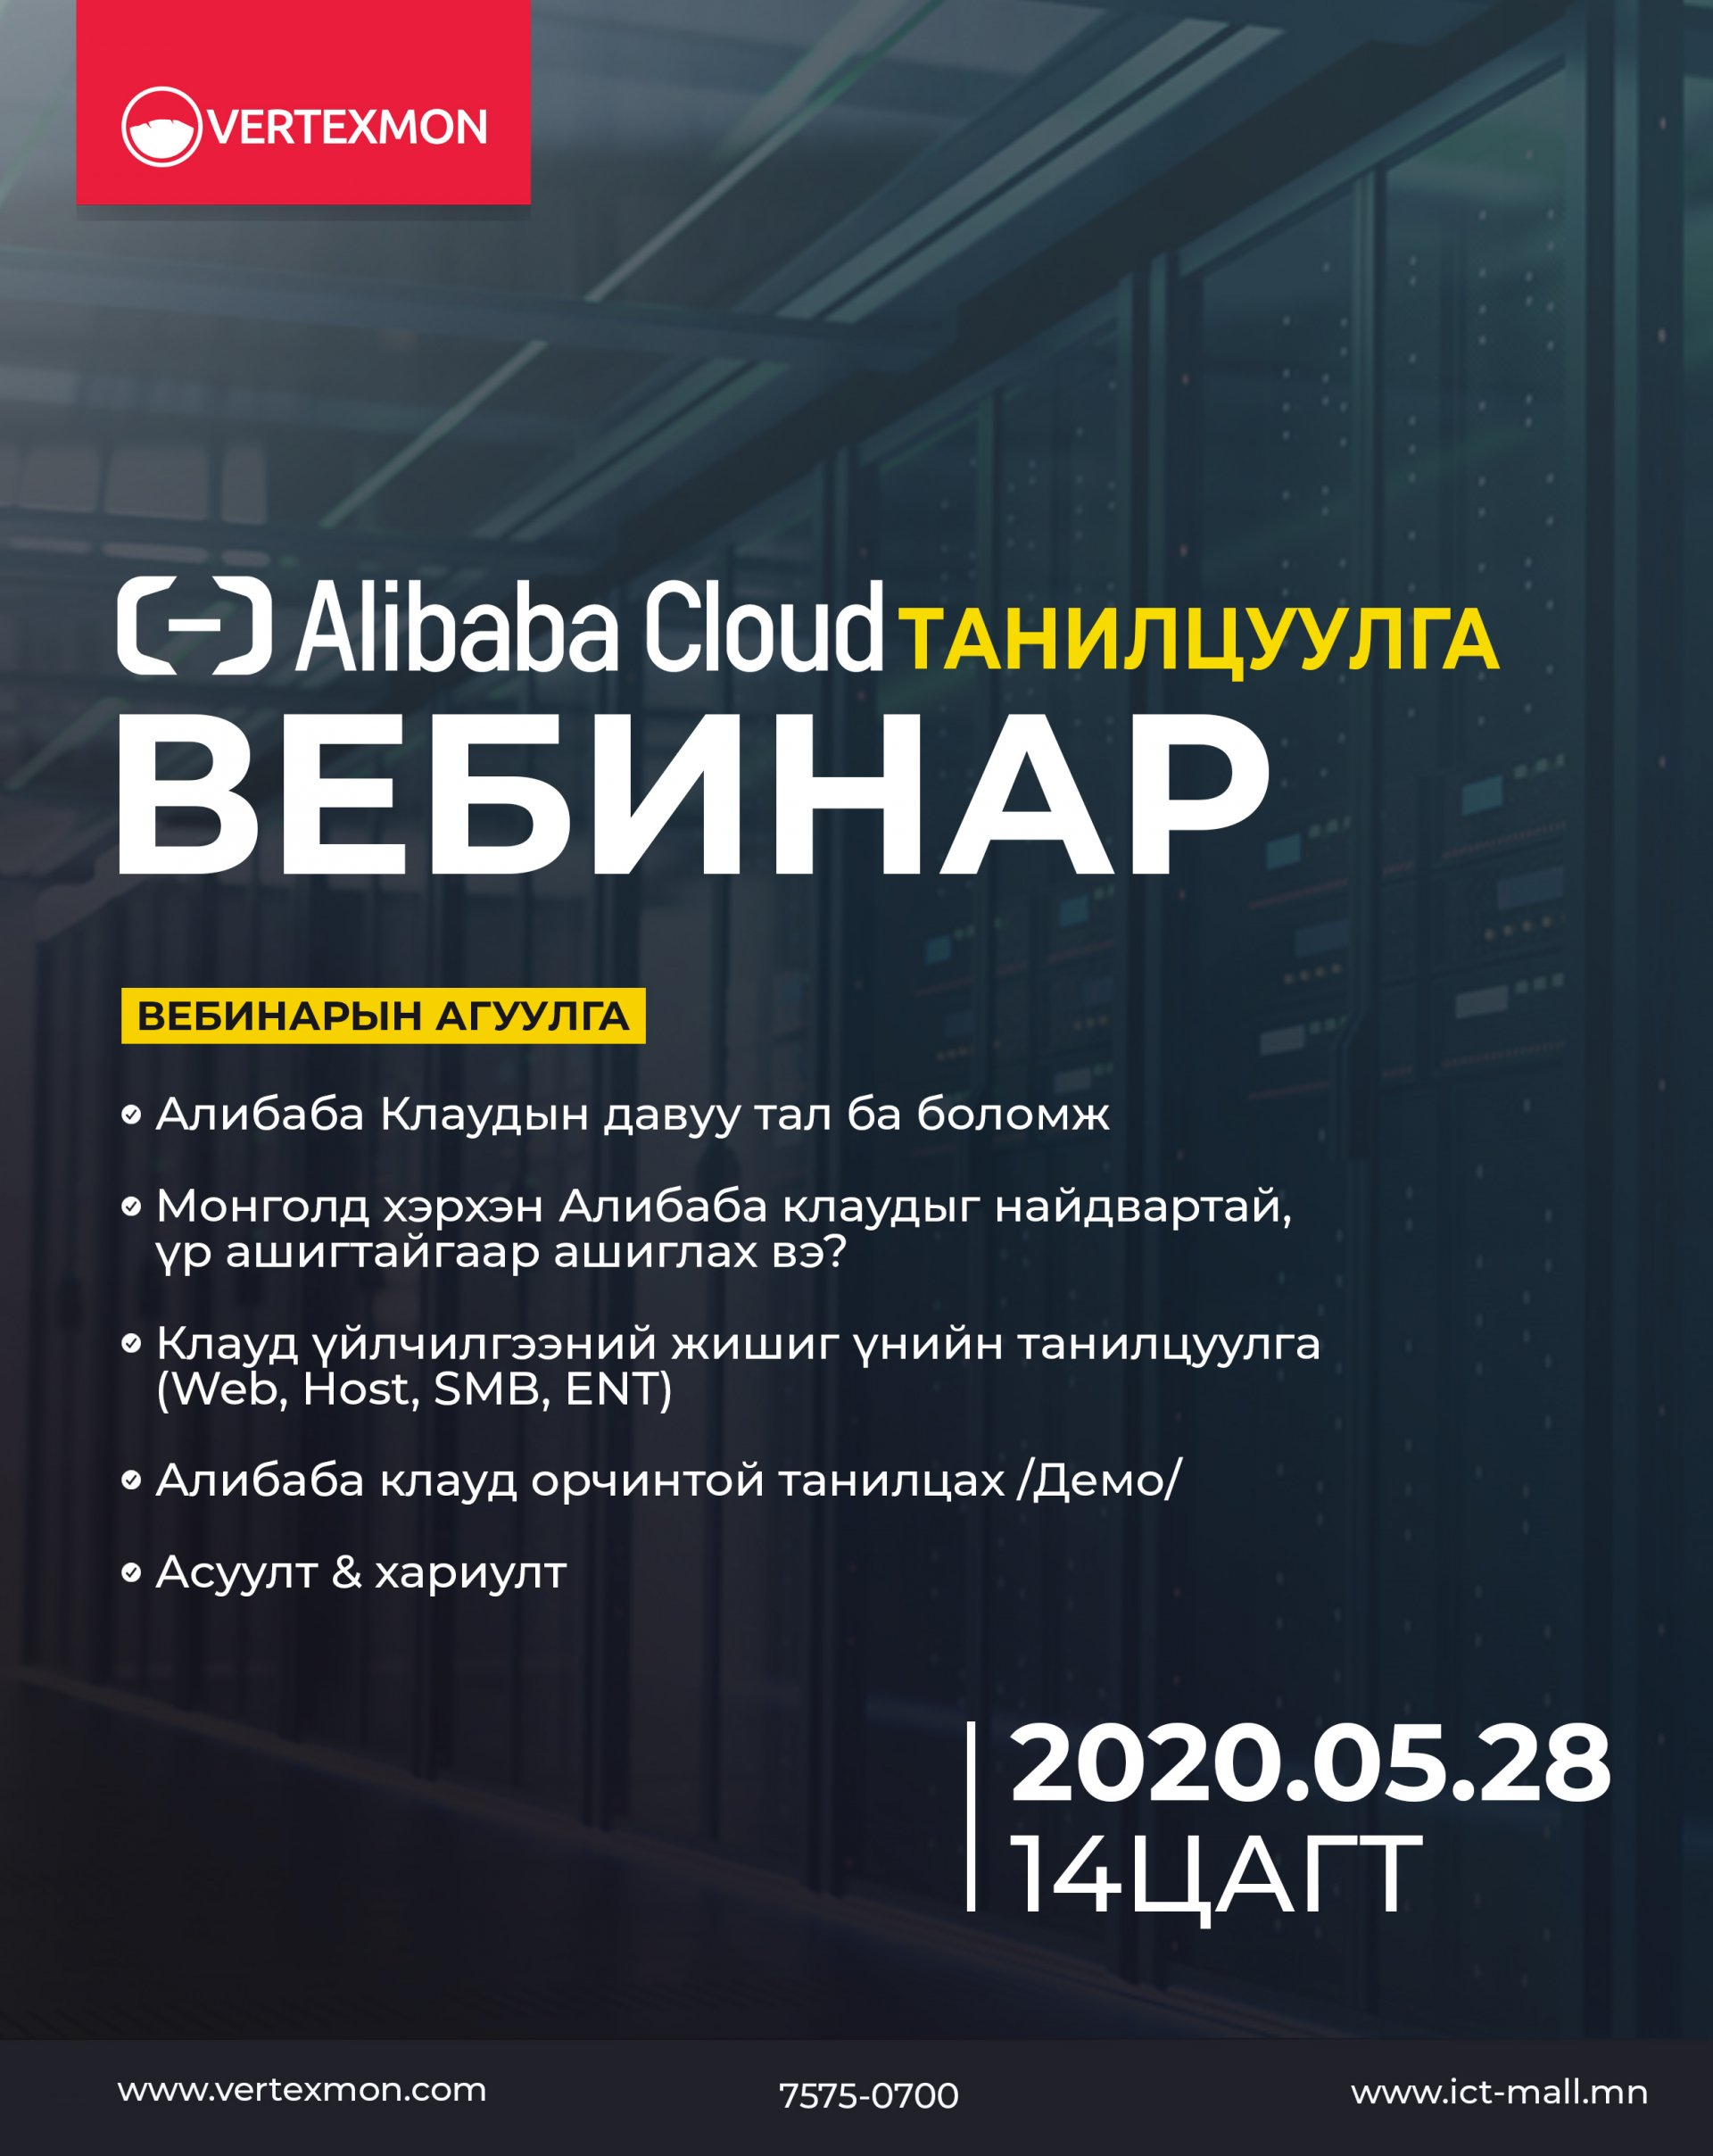 Alibaba Cloud Танилцуулга Вебинар